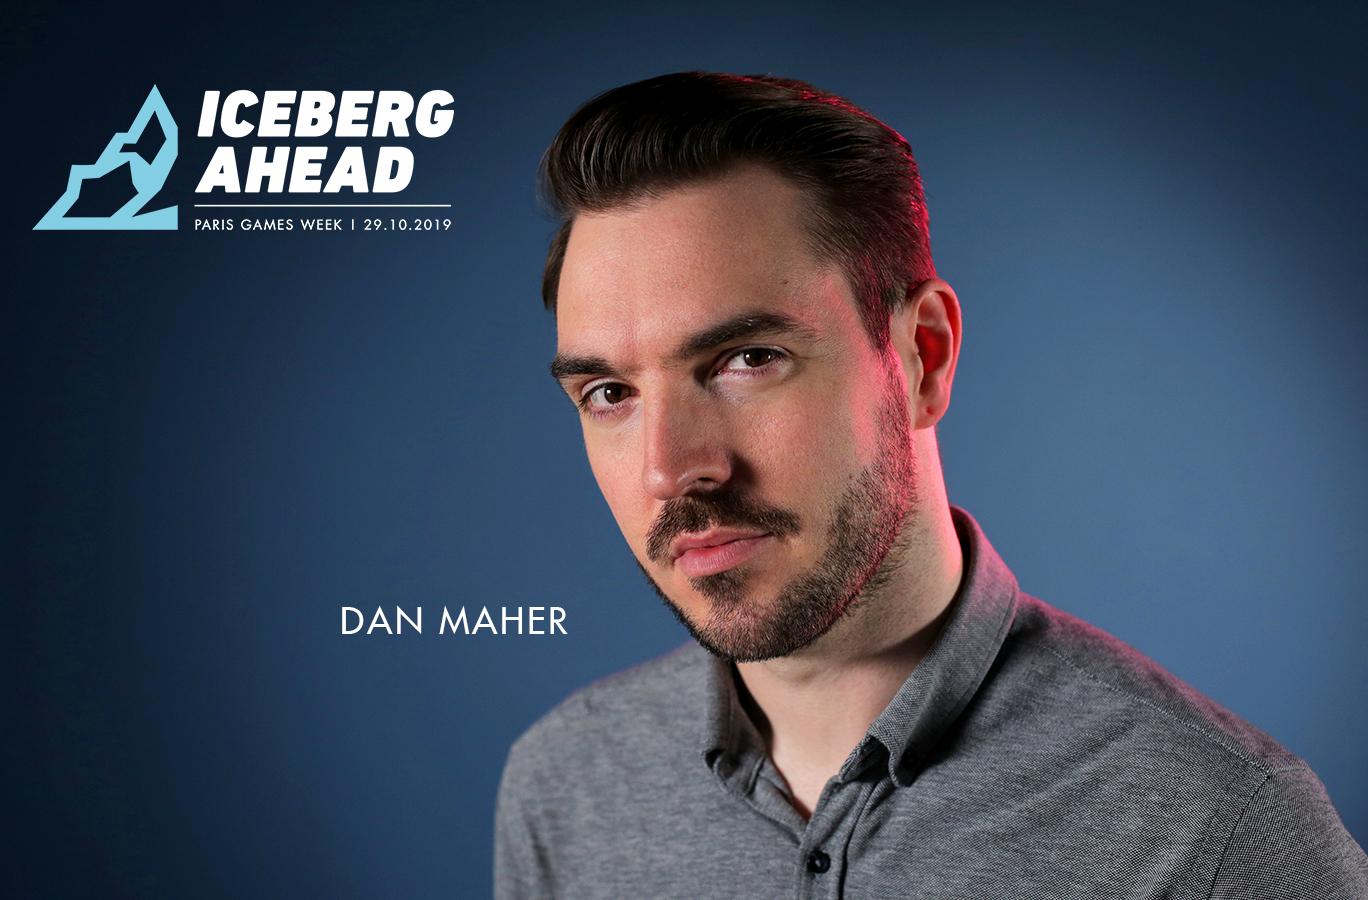 Dan Maher presents Iceberg Ahead